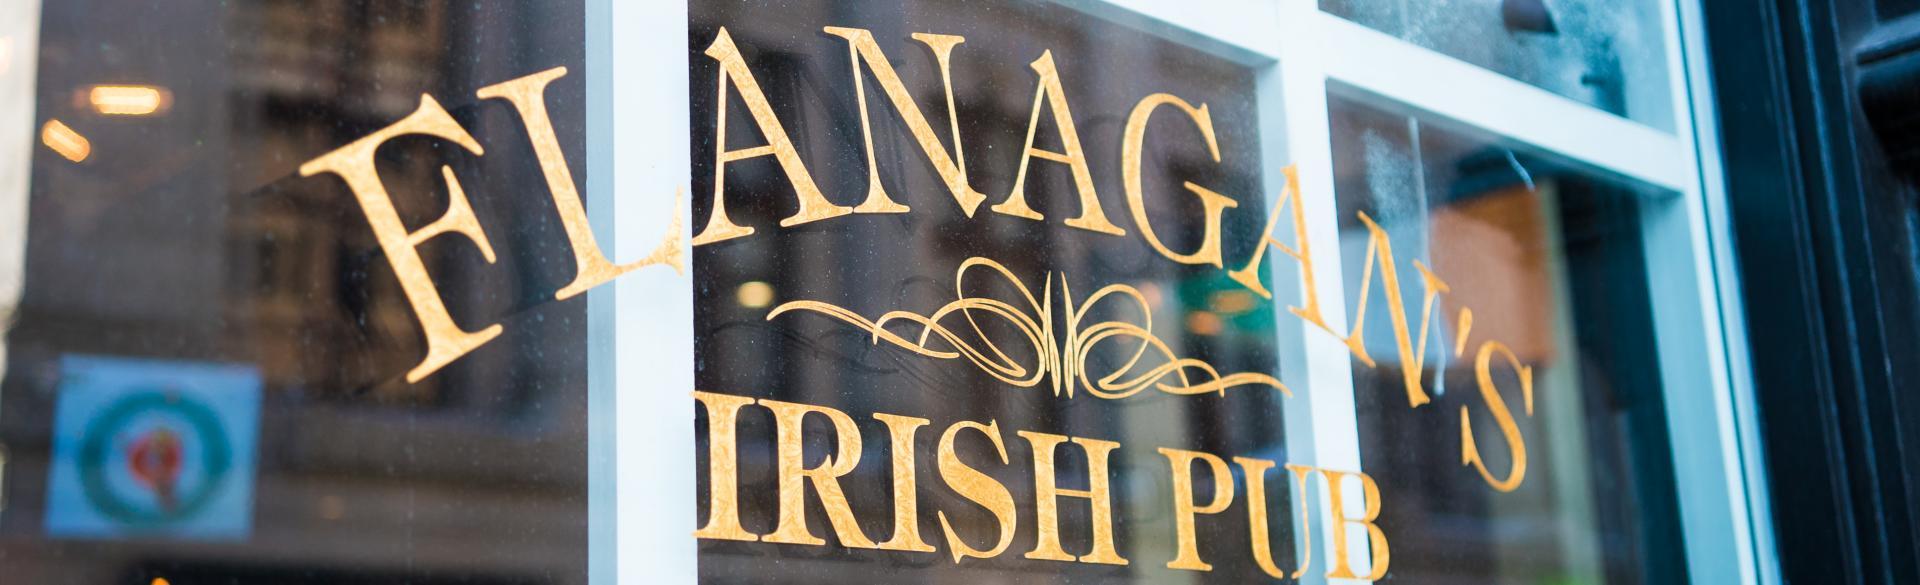 "Close up of window reading ""Flanagan's Irish Pub"""